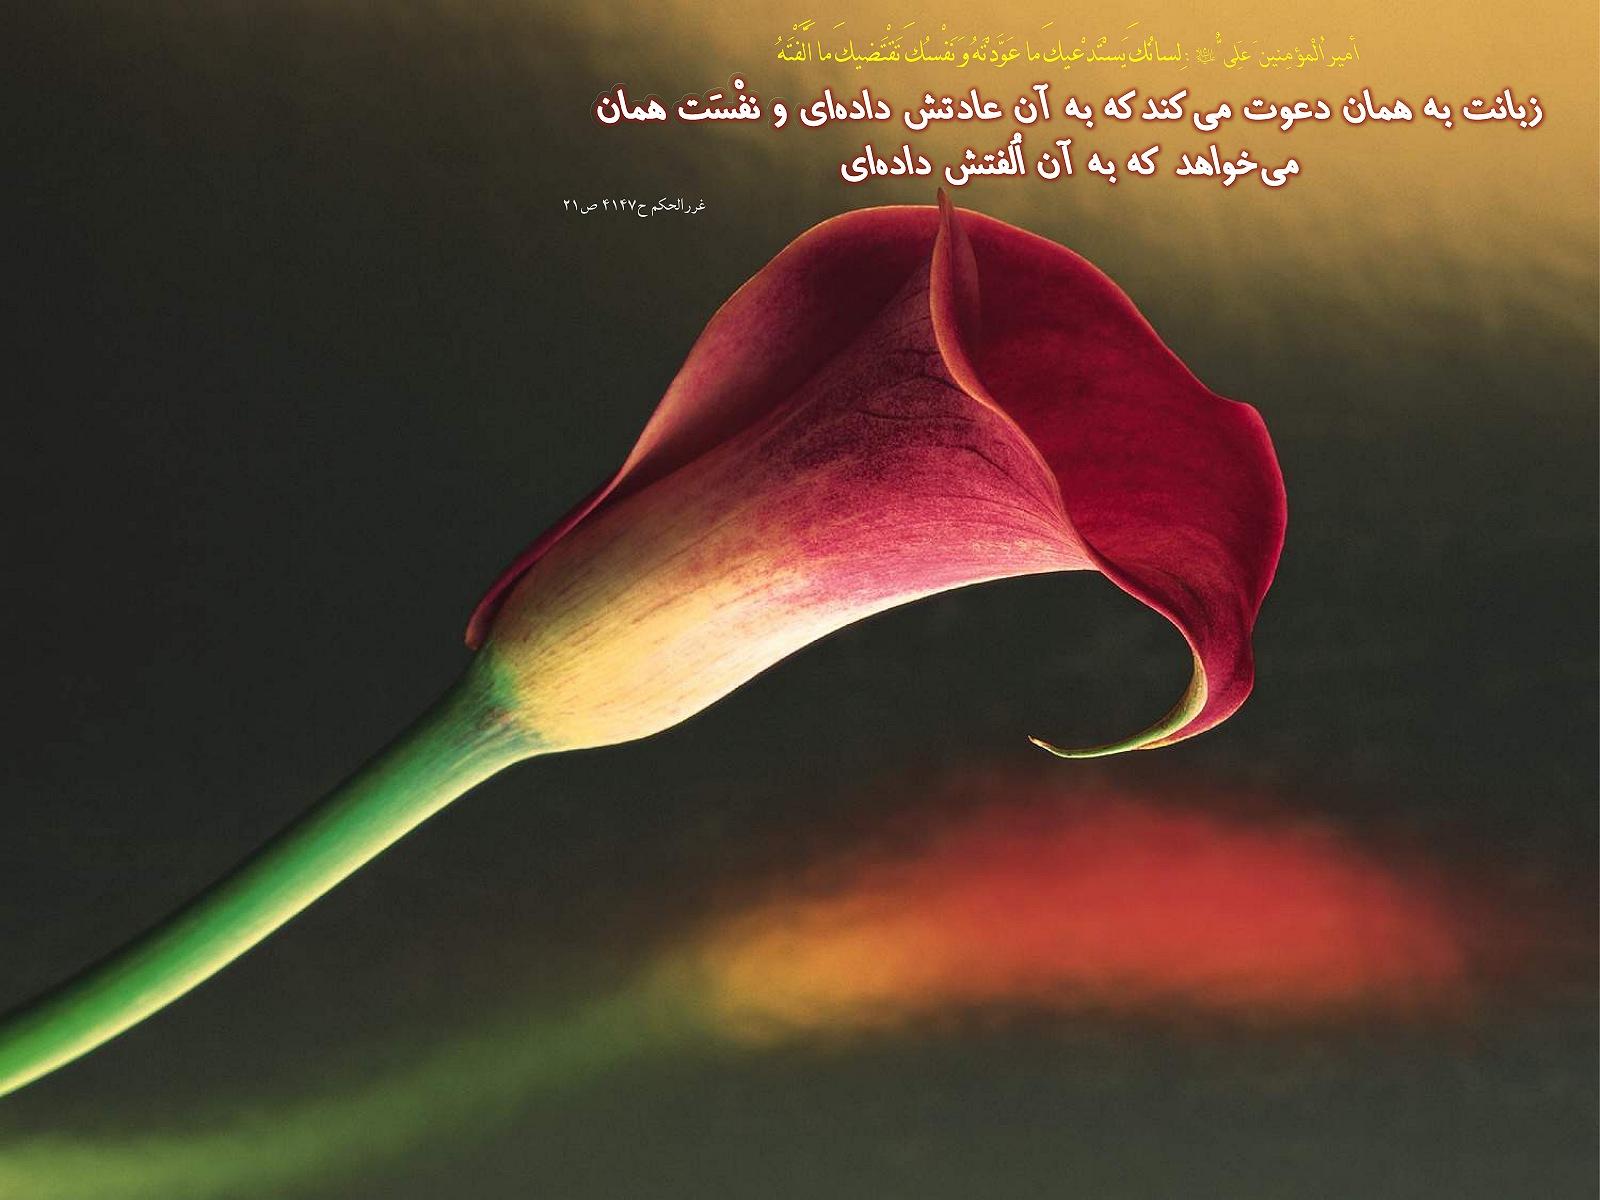 http://mhkh1972.gohardasht.com/uploaded/_B30D7B16-7C4F-494C-8BF7-9FFC2E2DF68E_.jpg